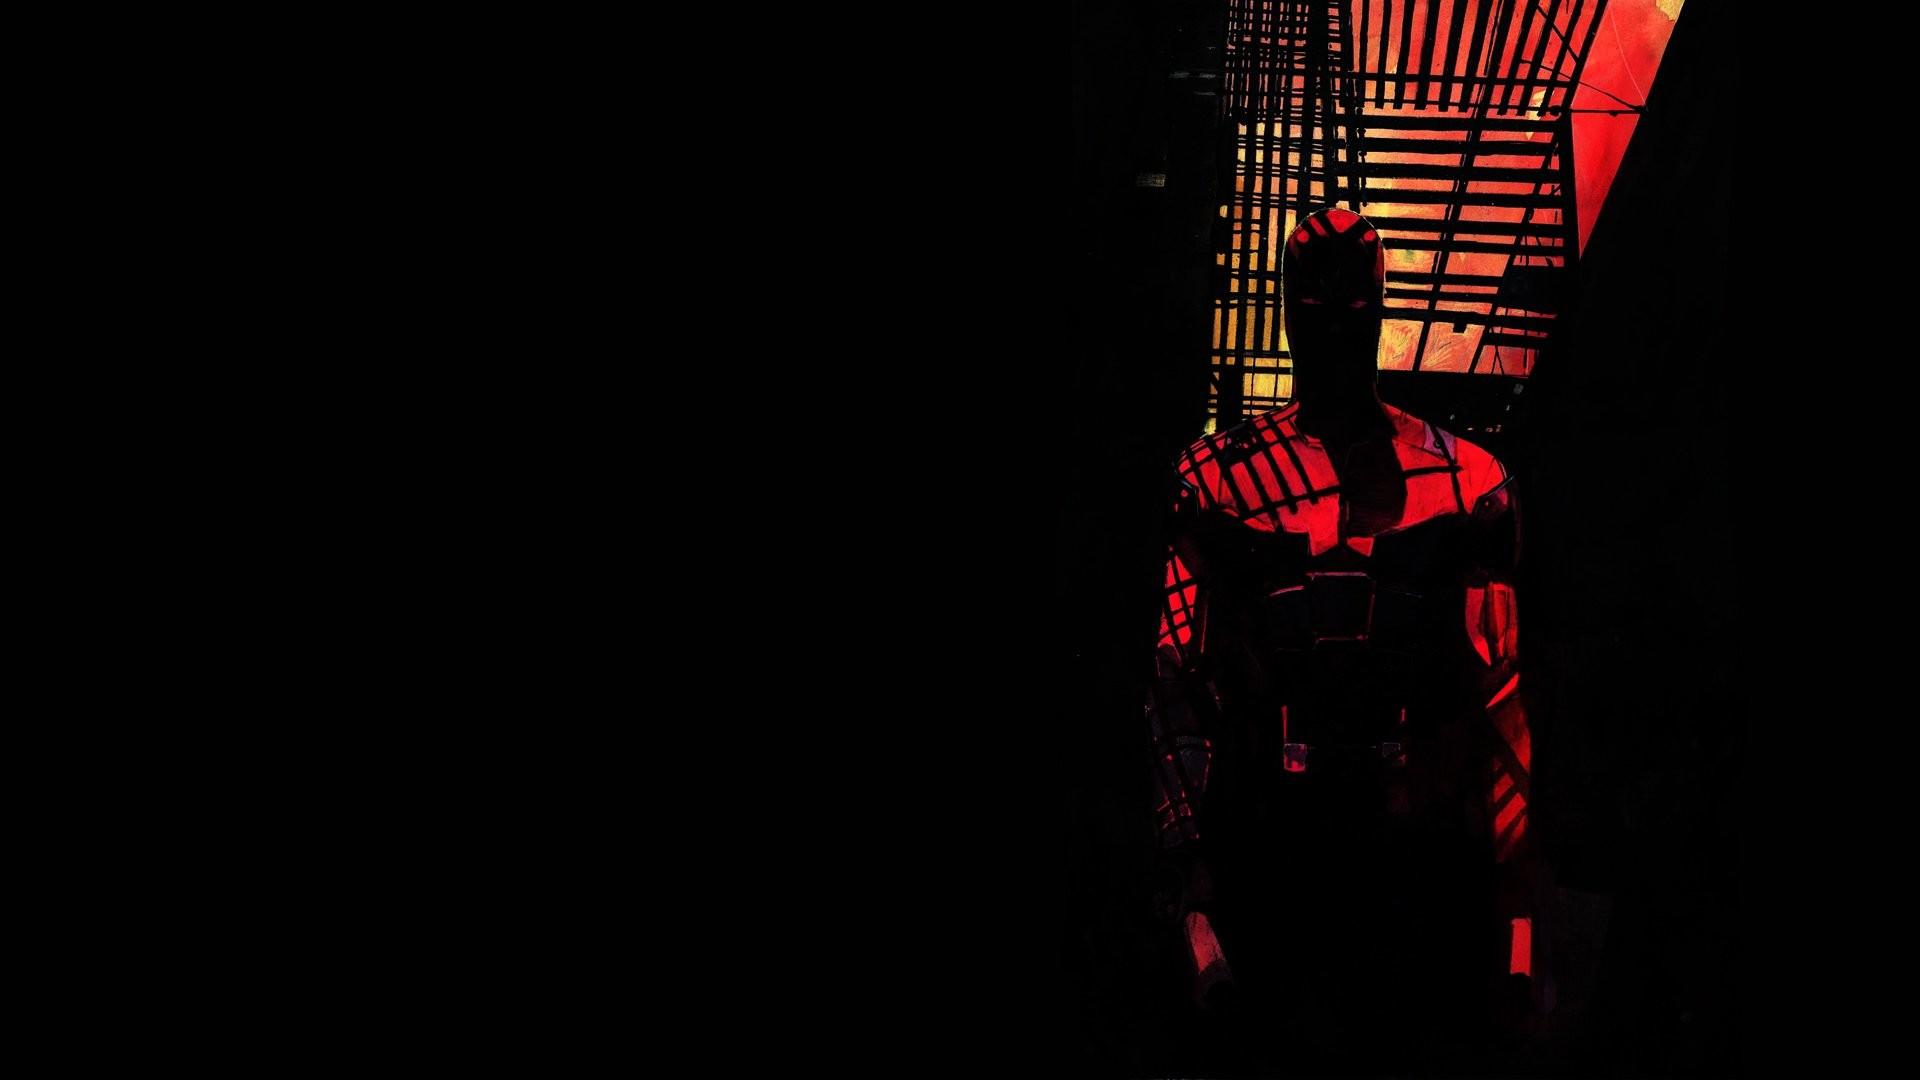 Res: 1920x1080, HD Wallpaper | Background Image ID:664158.  Comics Daredevil